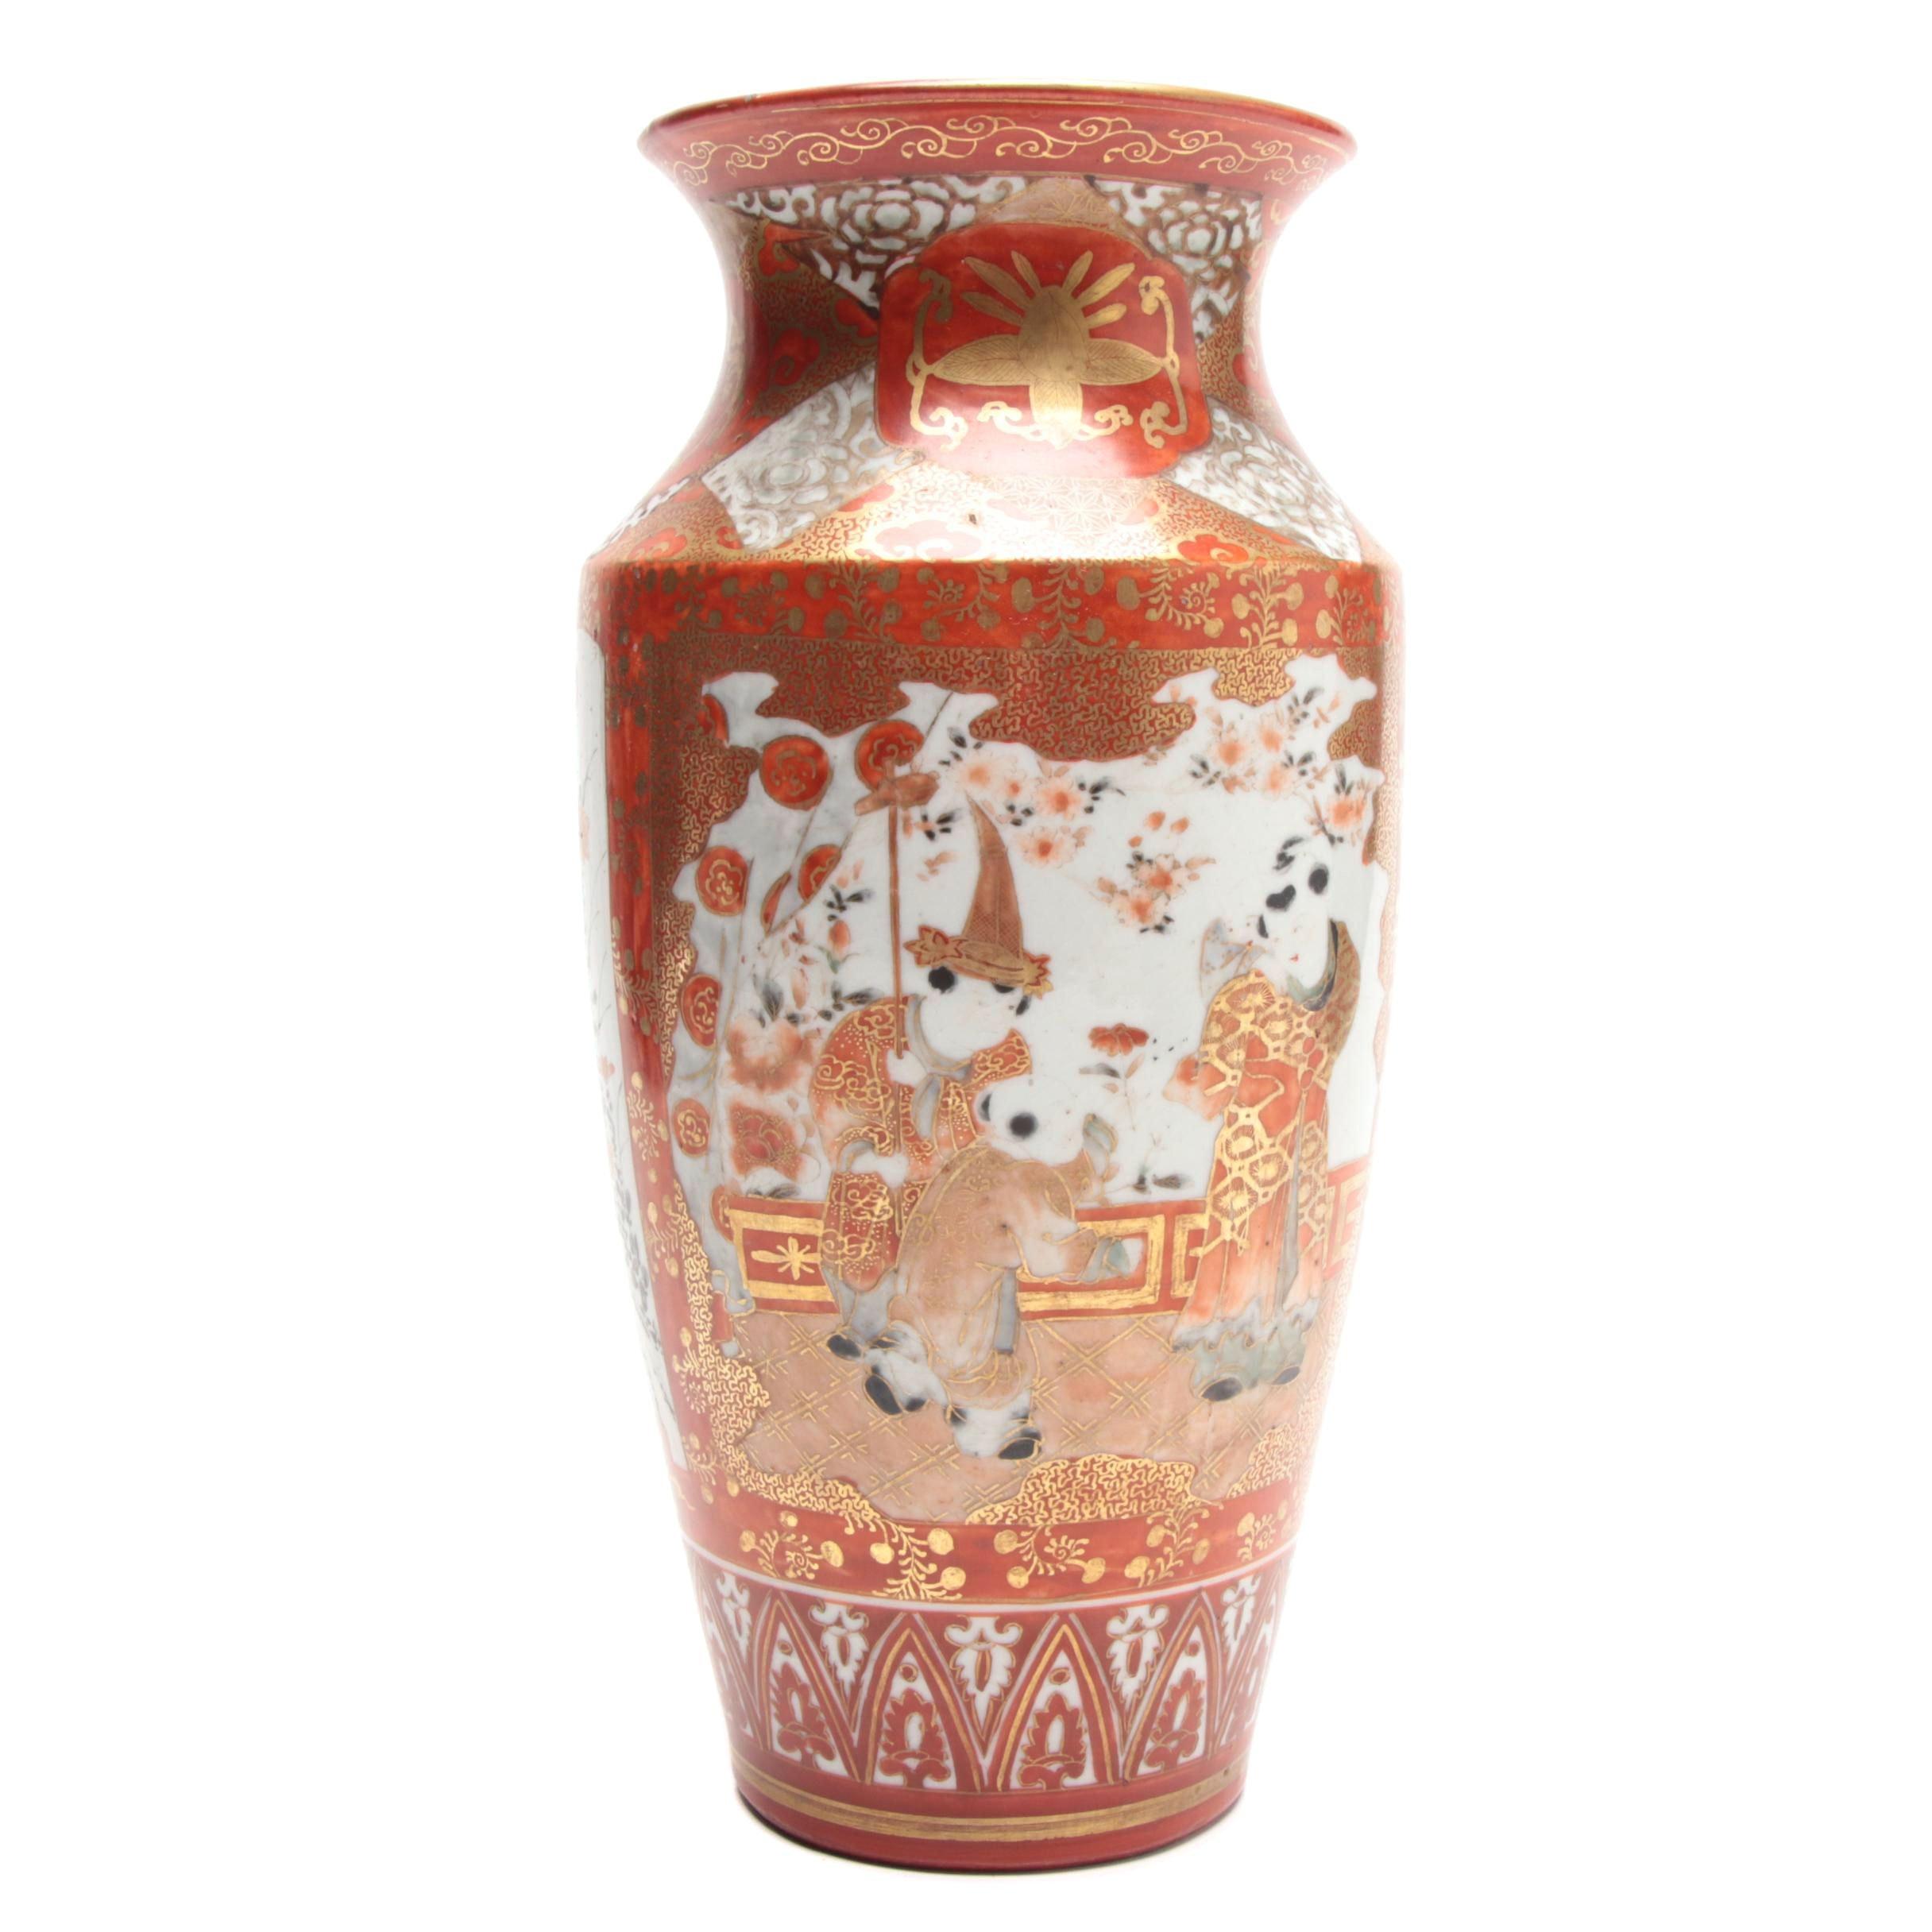 Japanese Porcelain Kutani Vase, Meiji Period